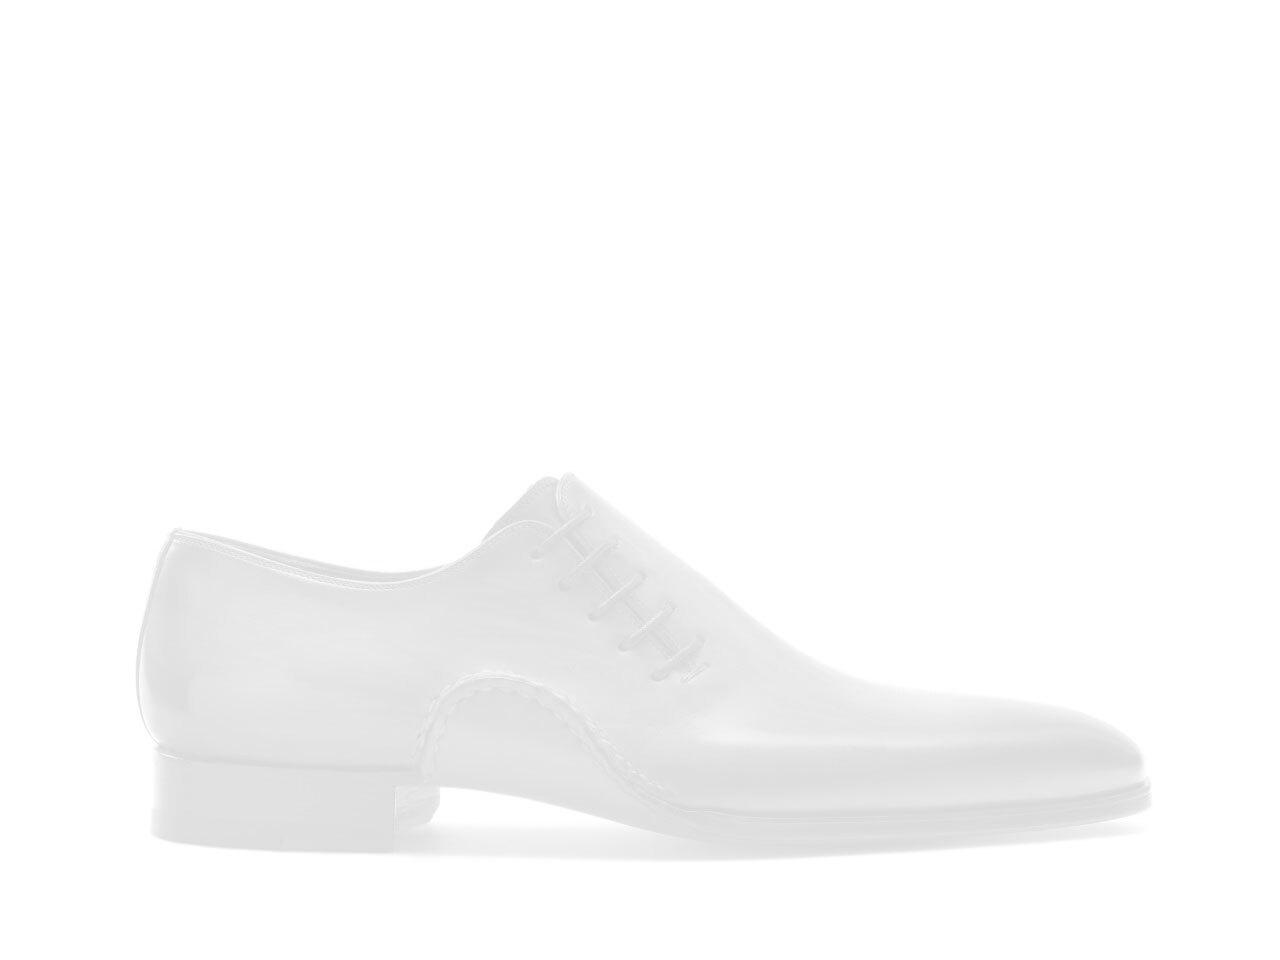 Side view of the Magnanni Estovan Midbrown and Cuero Men's Oxford Shoes